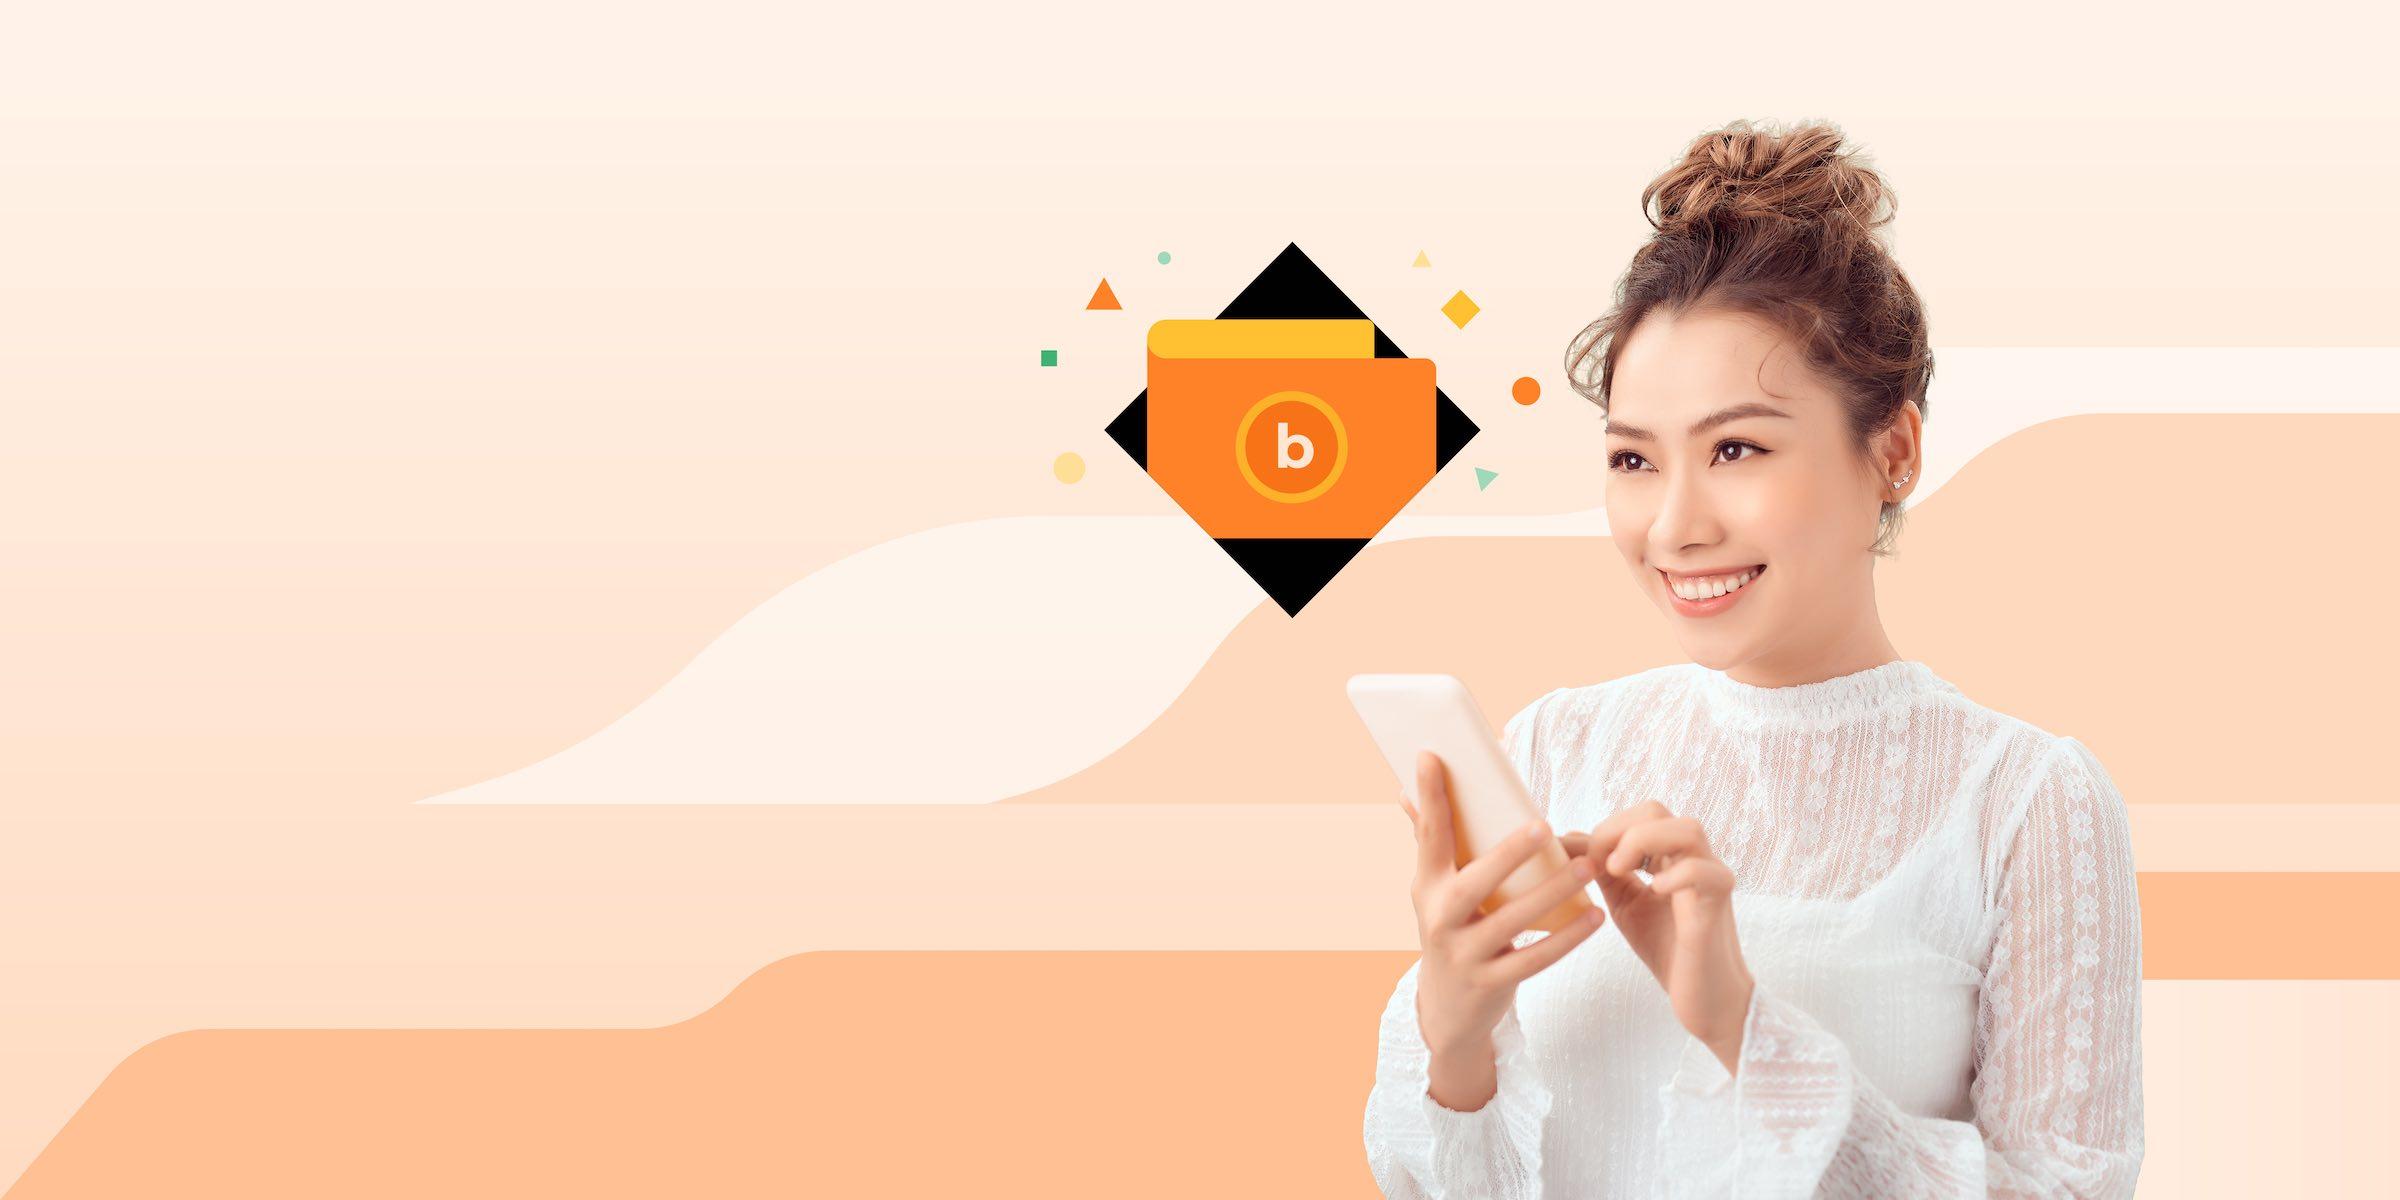 bpay-banner-nhanh-chong-tien-loi-ver3